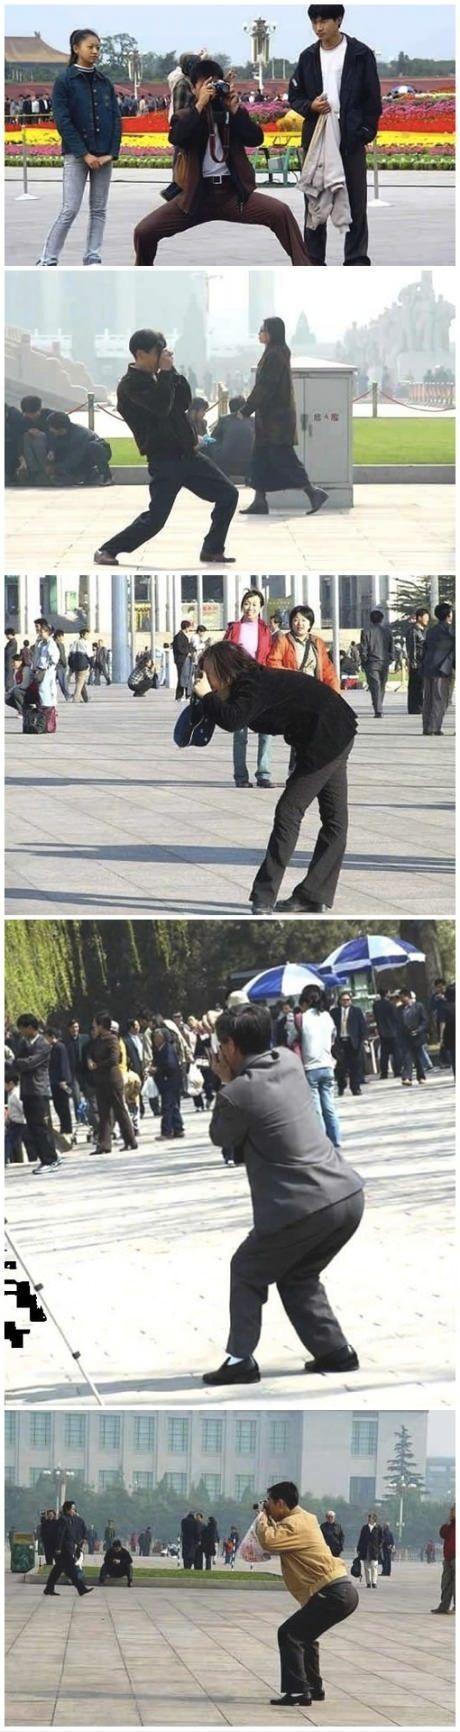 Photography level: Asian